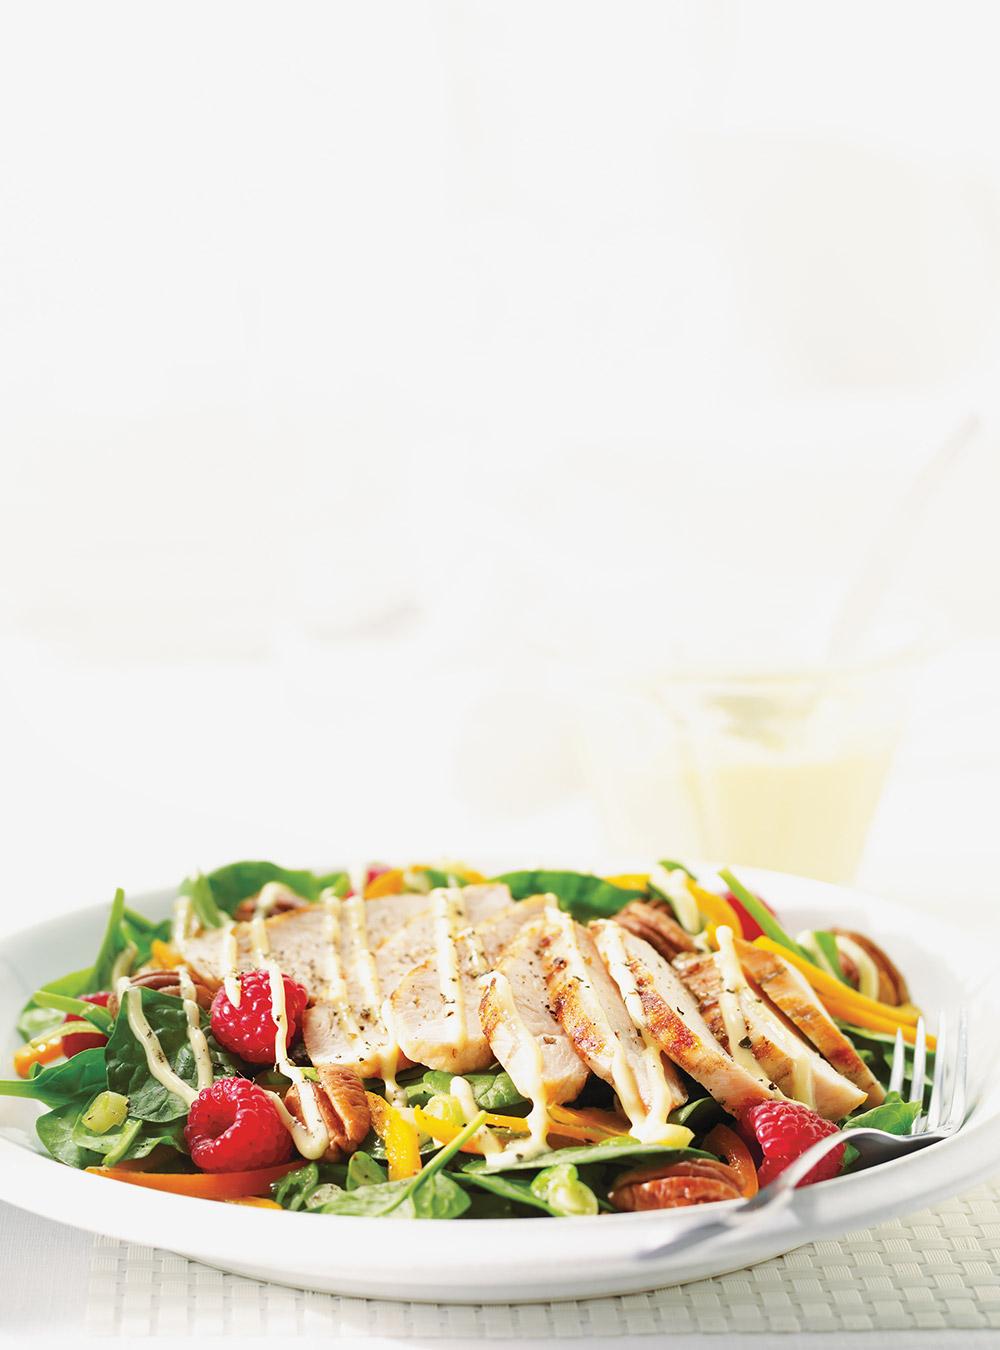 Salade californienne au poulet | ricardo